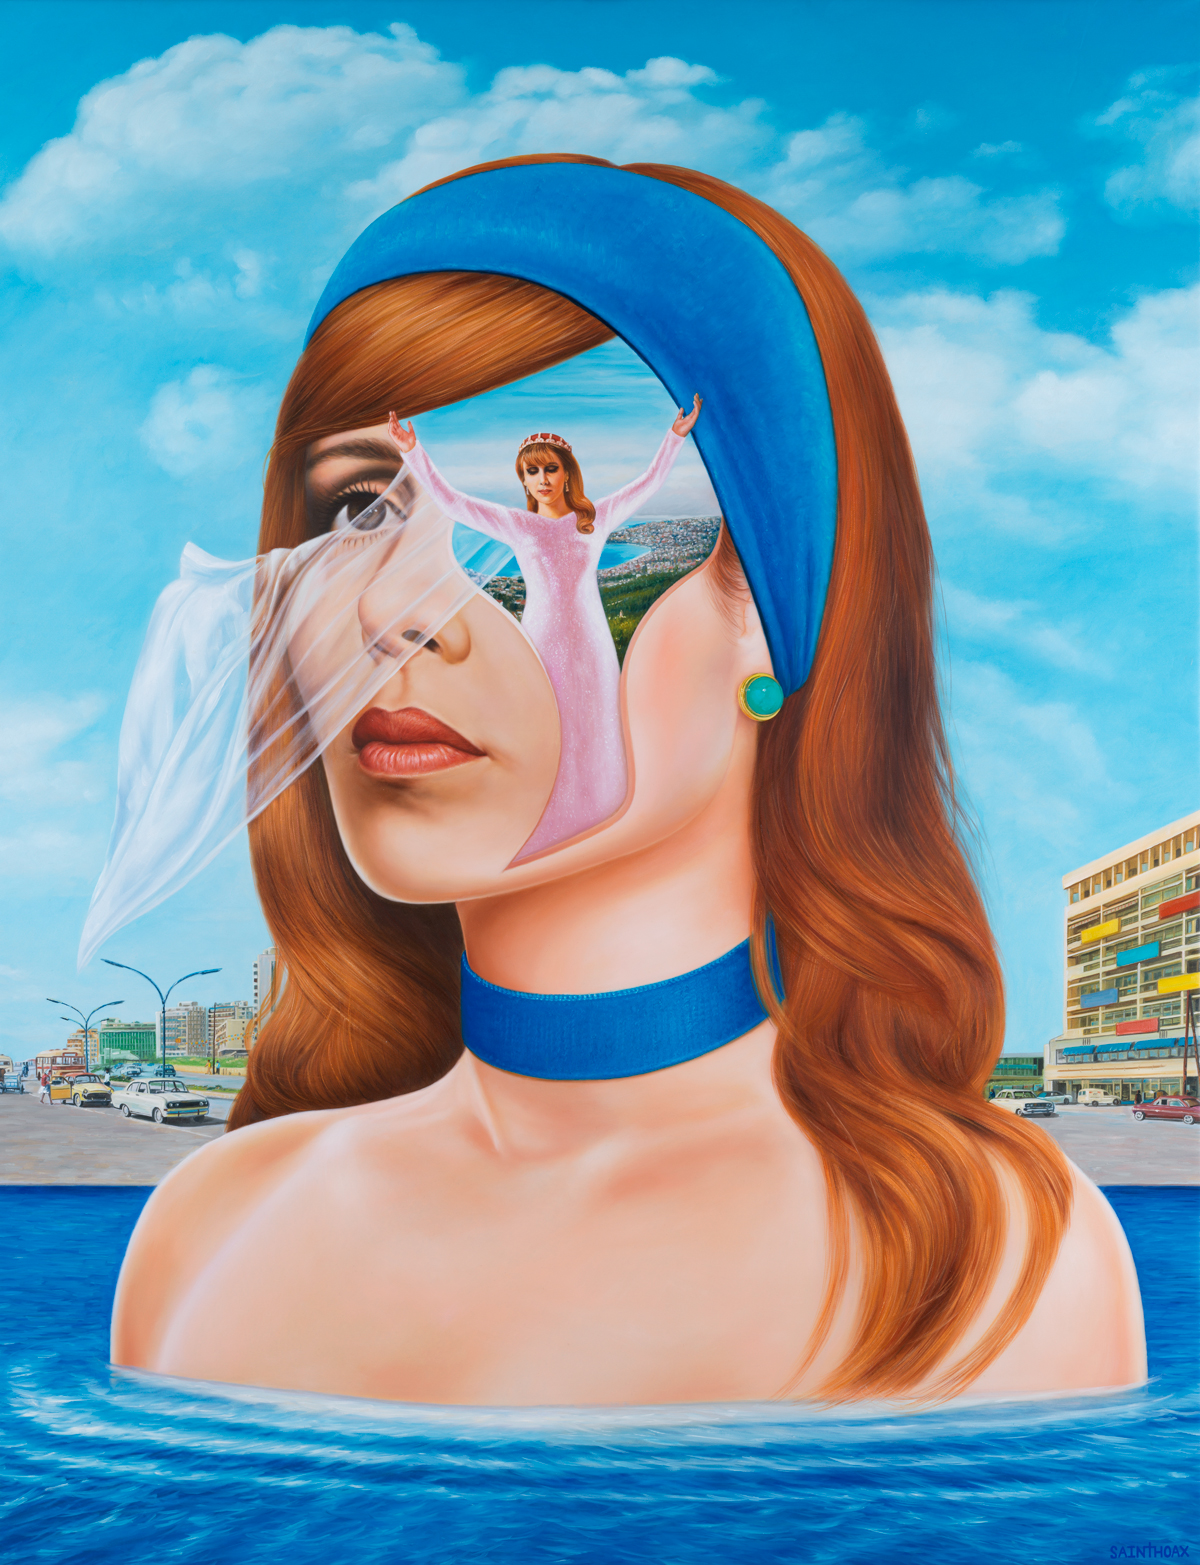 Ode to Fairouz - 2018Oil on canvas115 x 150 cm ( 45.2 x 59 in)$42,000